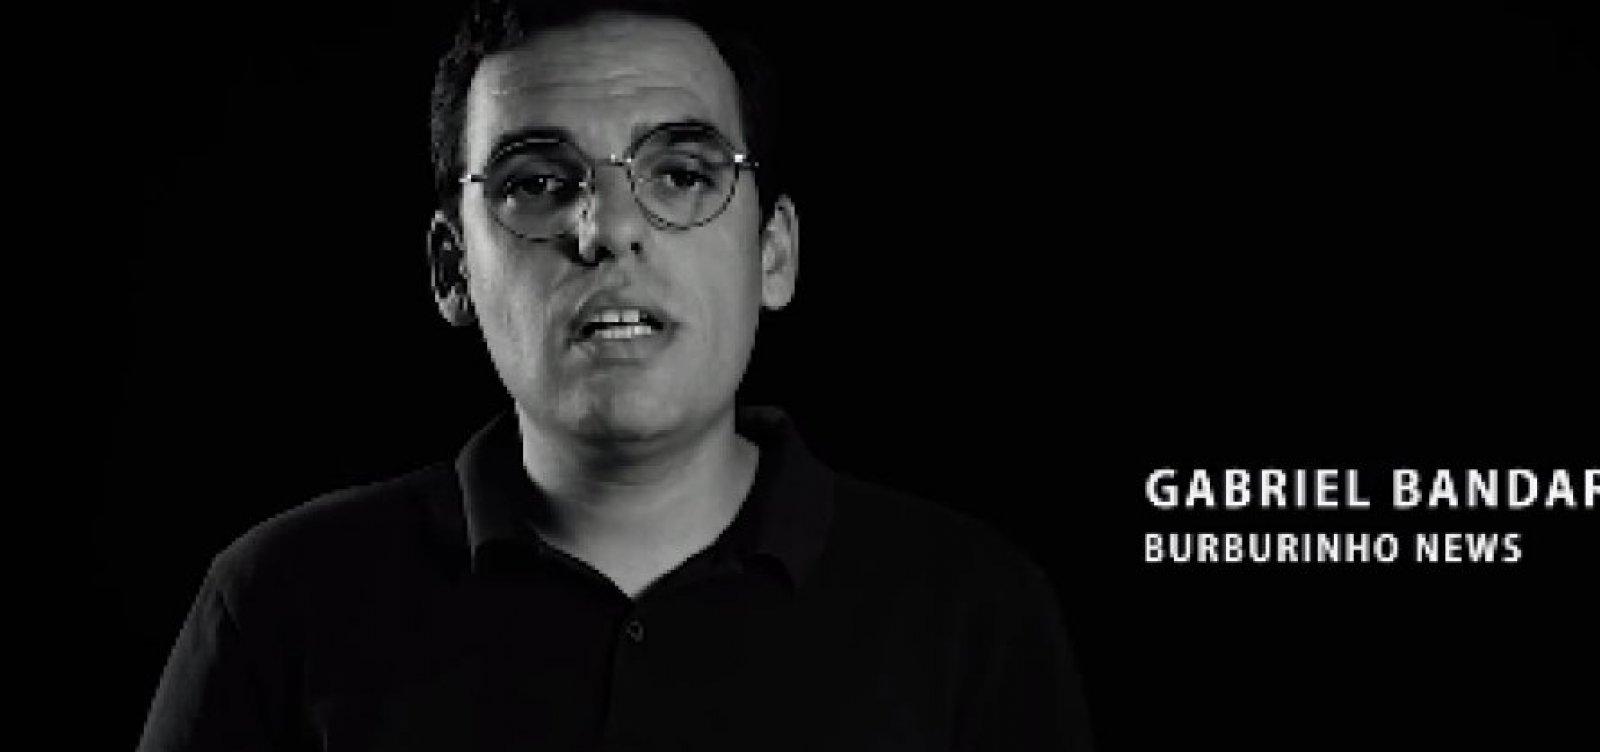 Jornalista é agredido por prefeito de Morro do Chapéu